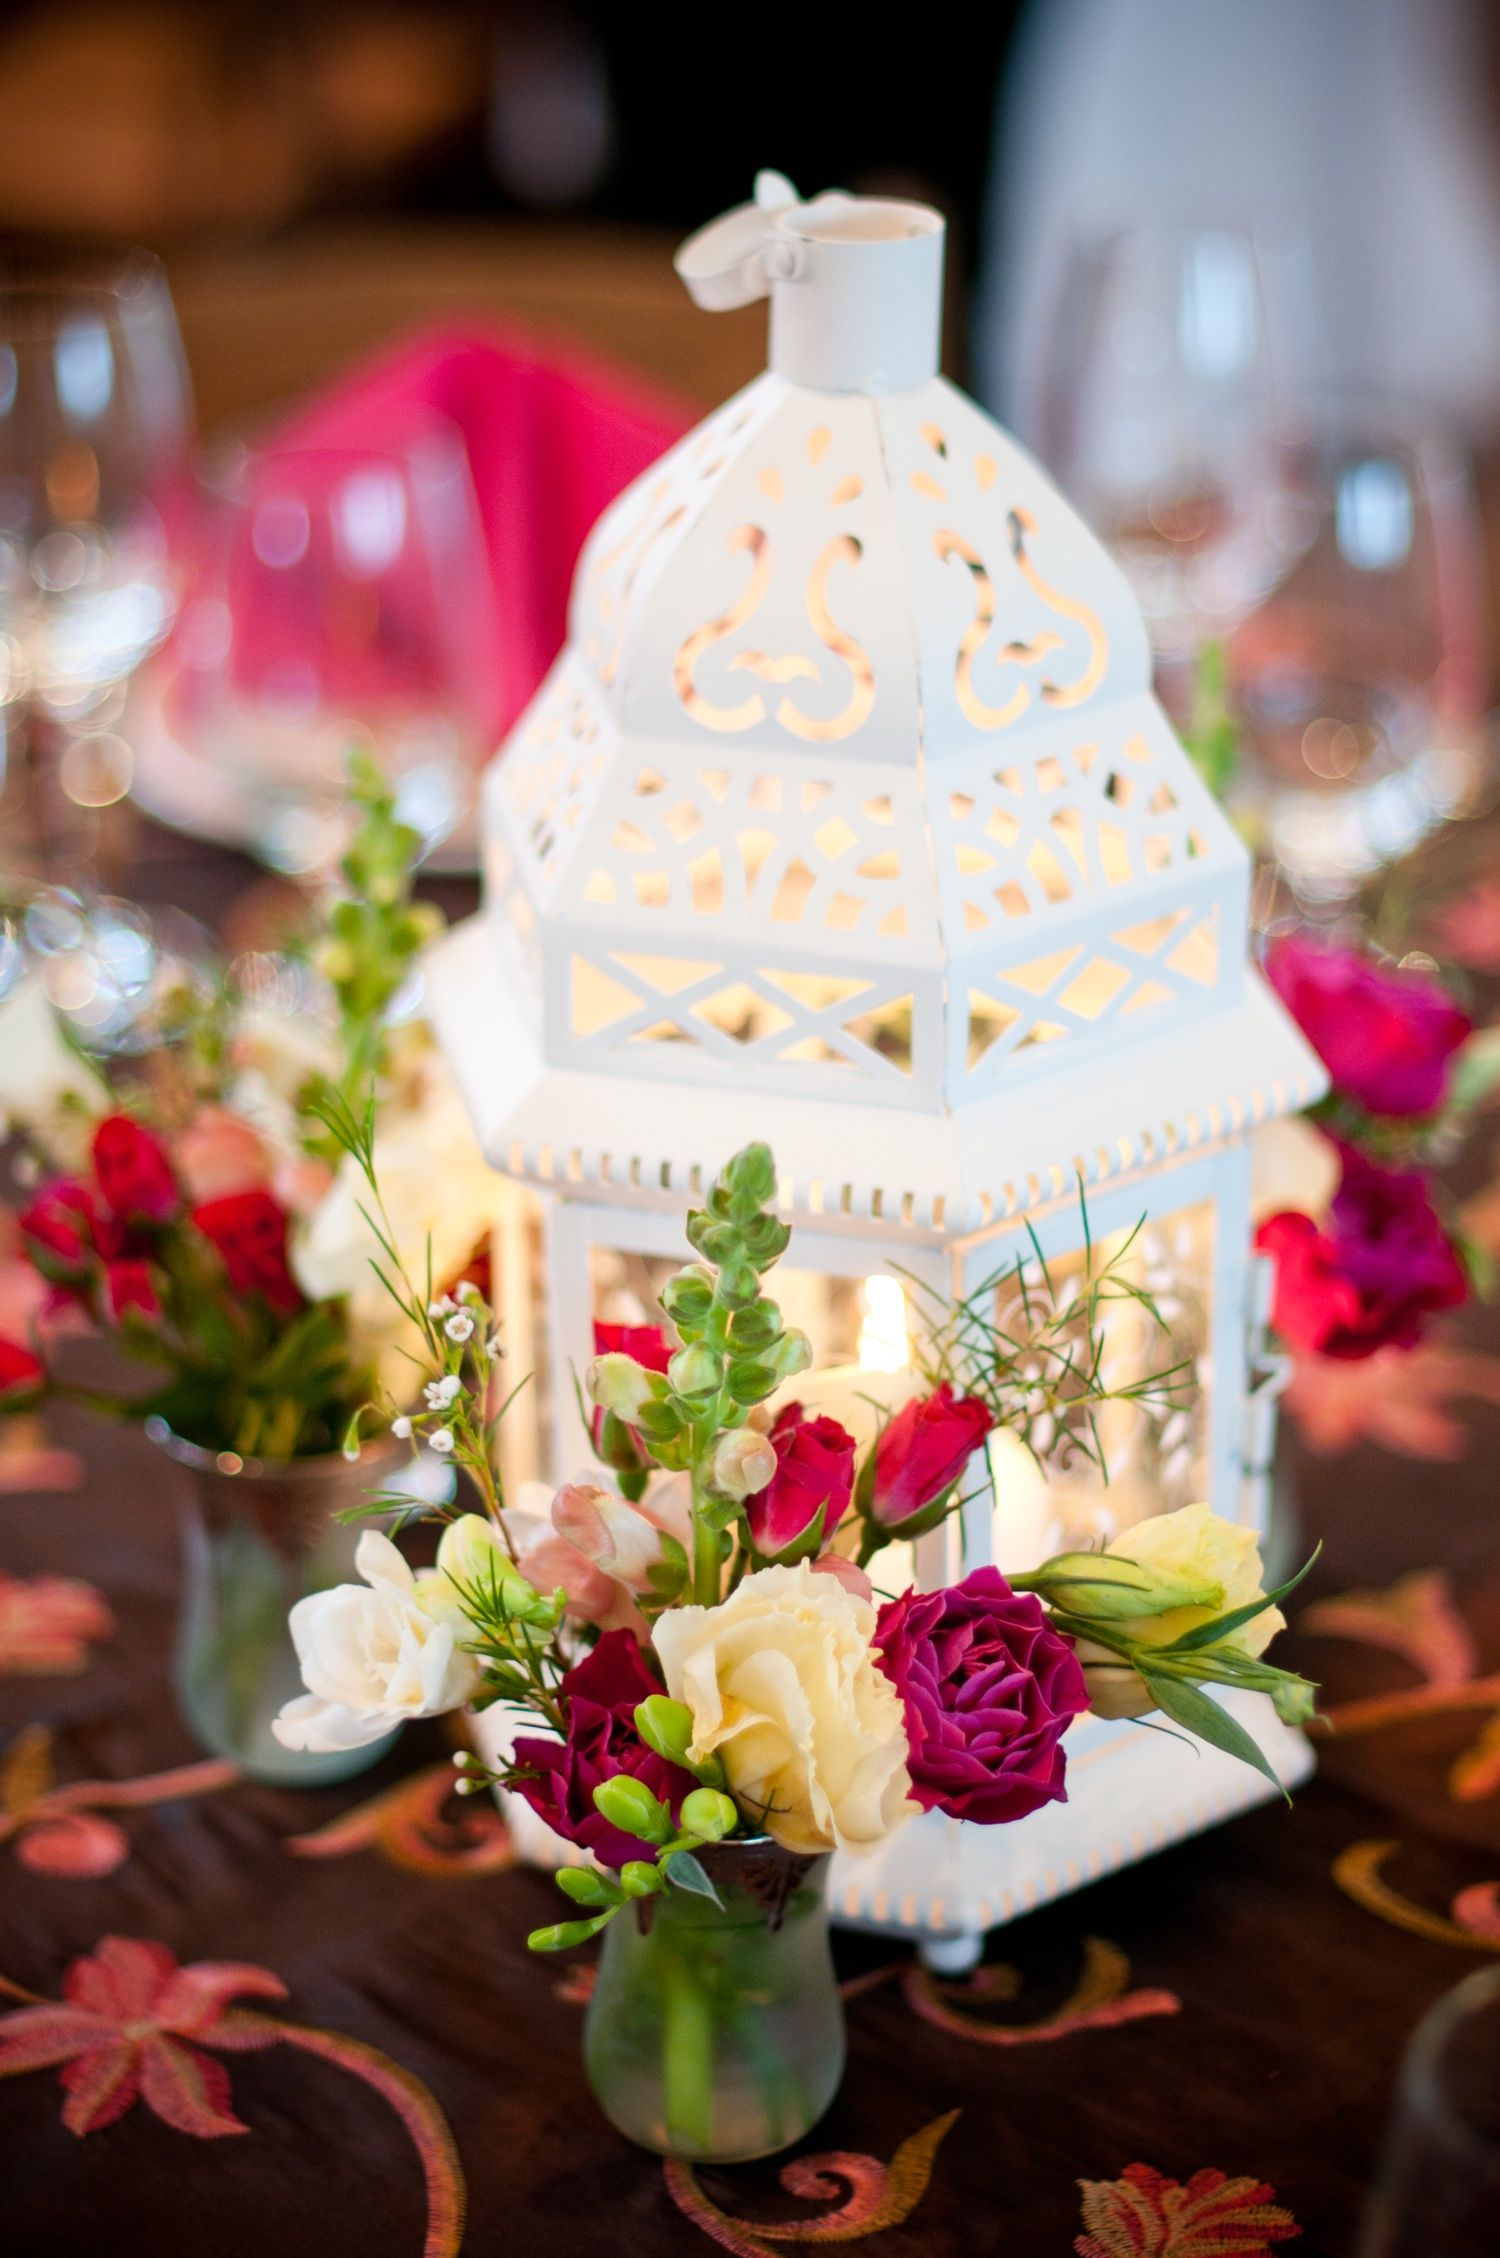 Homemade Wedding Reception Centerpieces